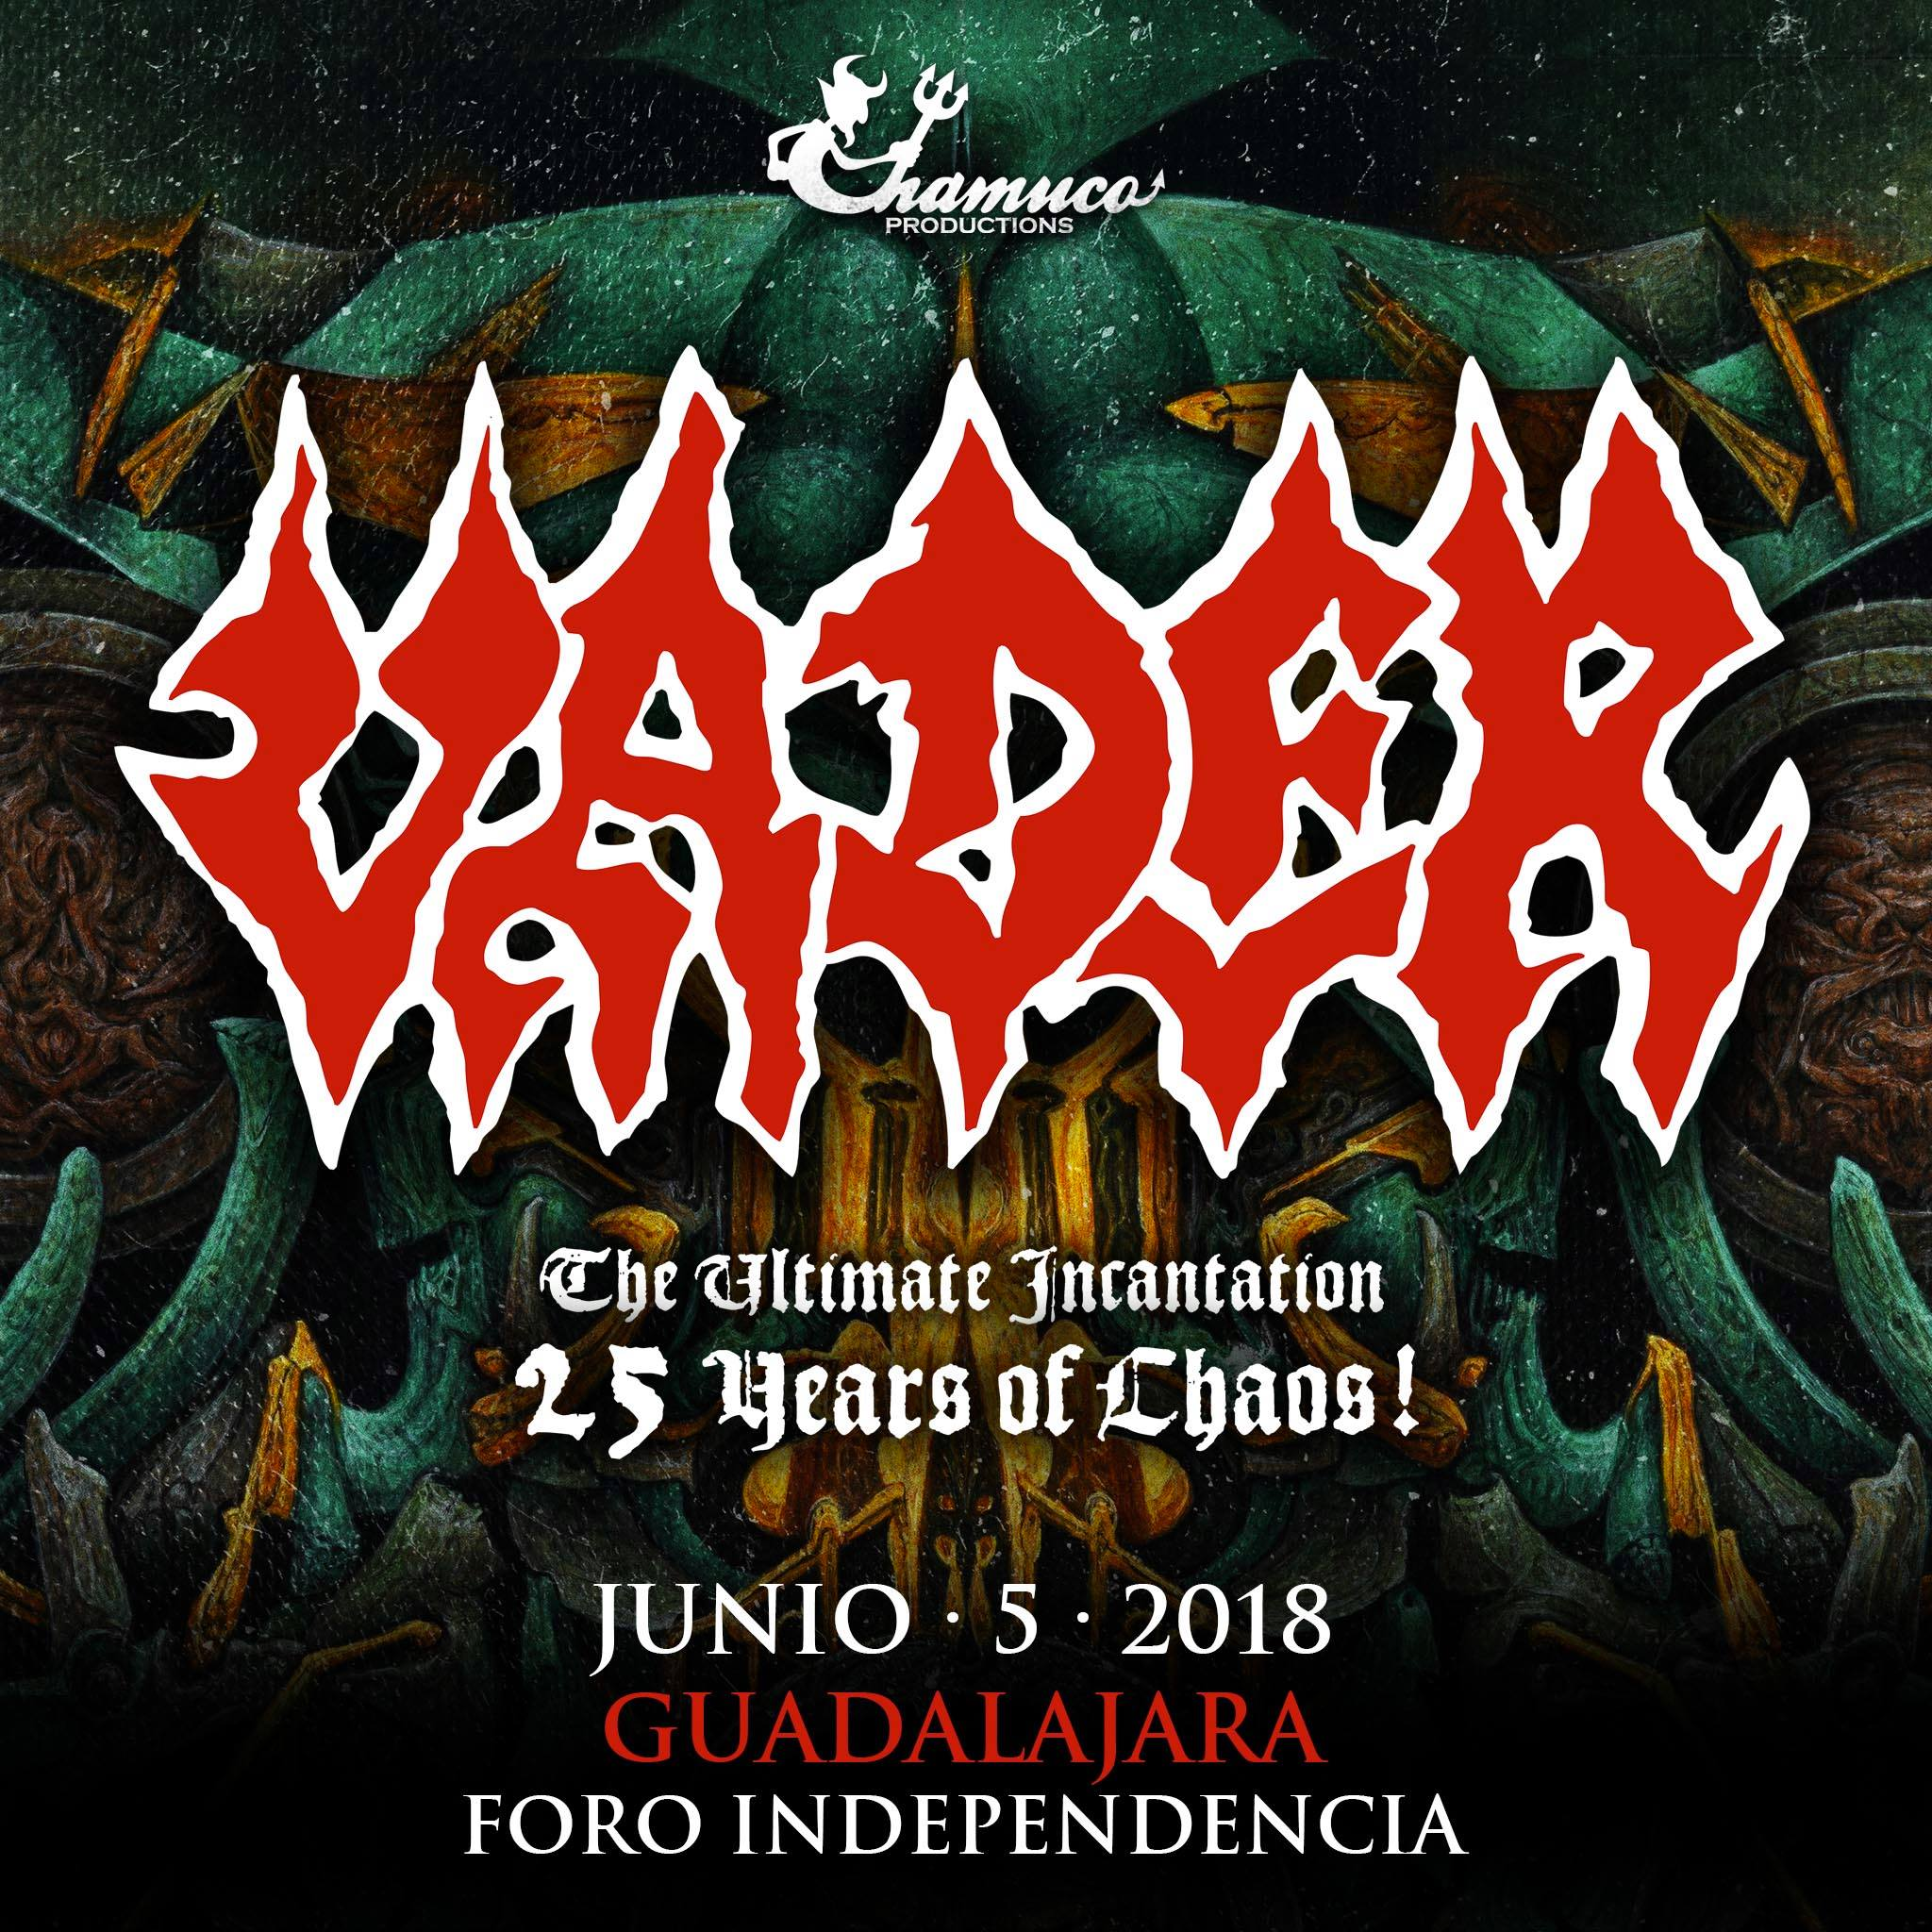 Vader en Guadalajara (Foro Independencia) 2018